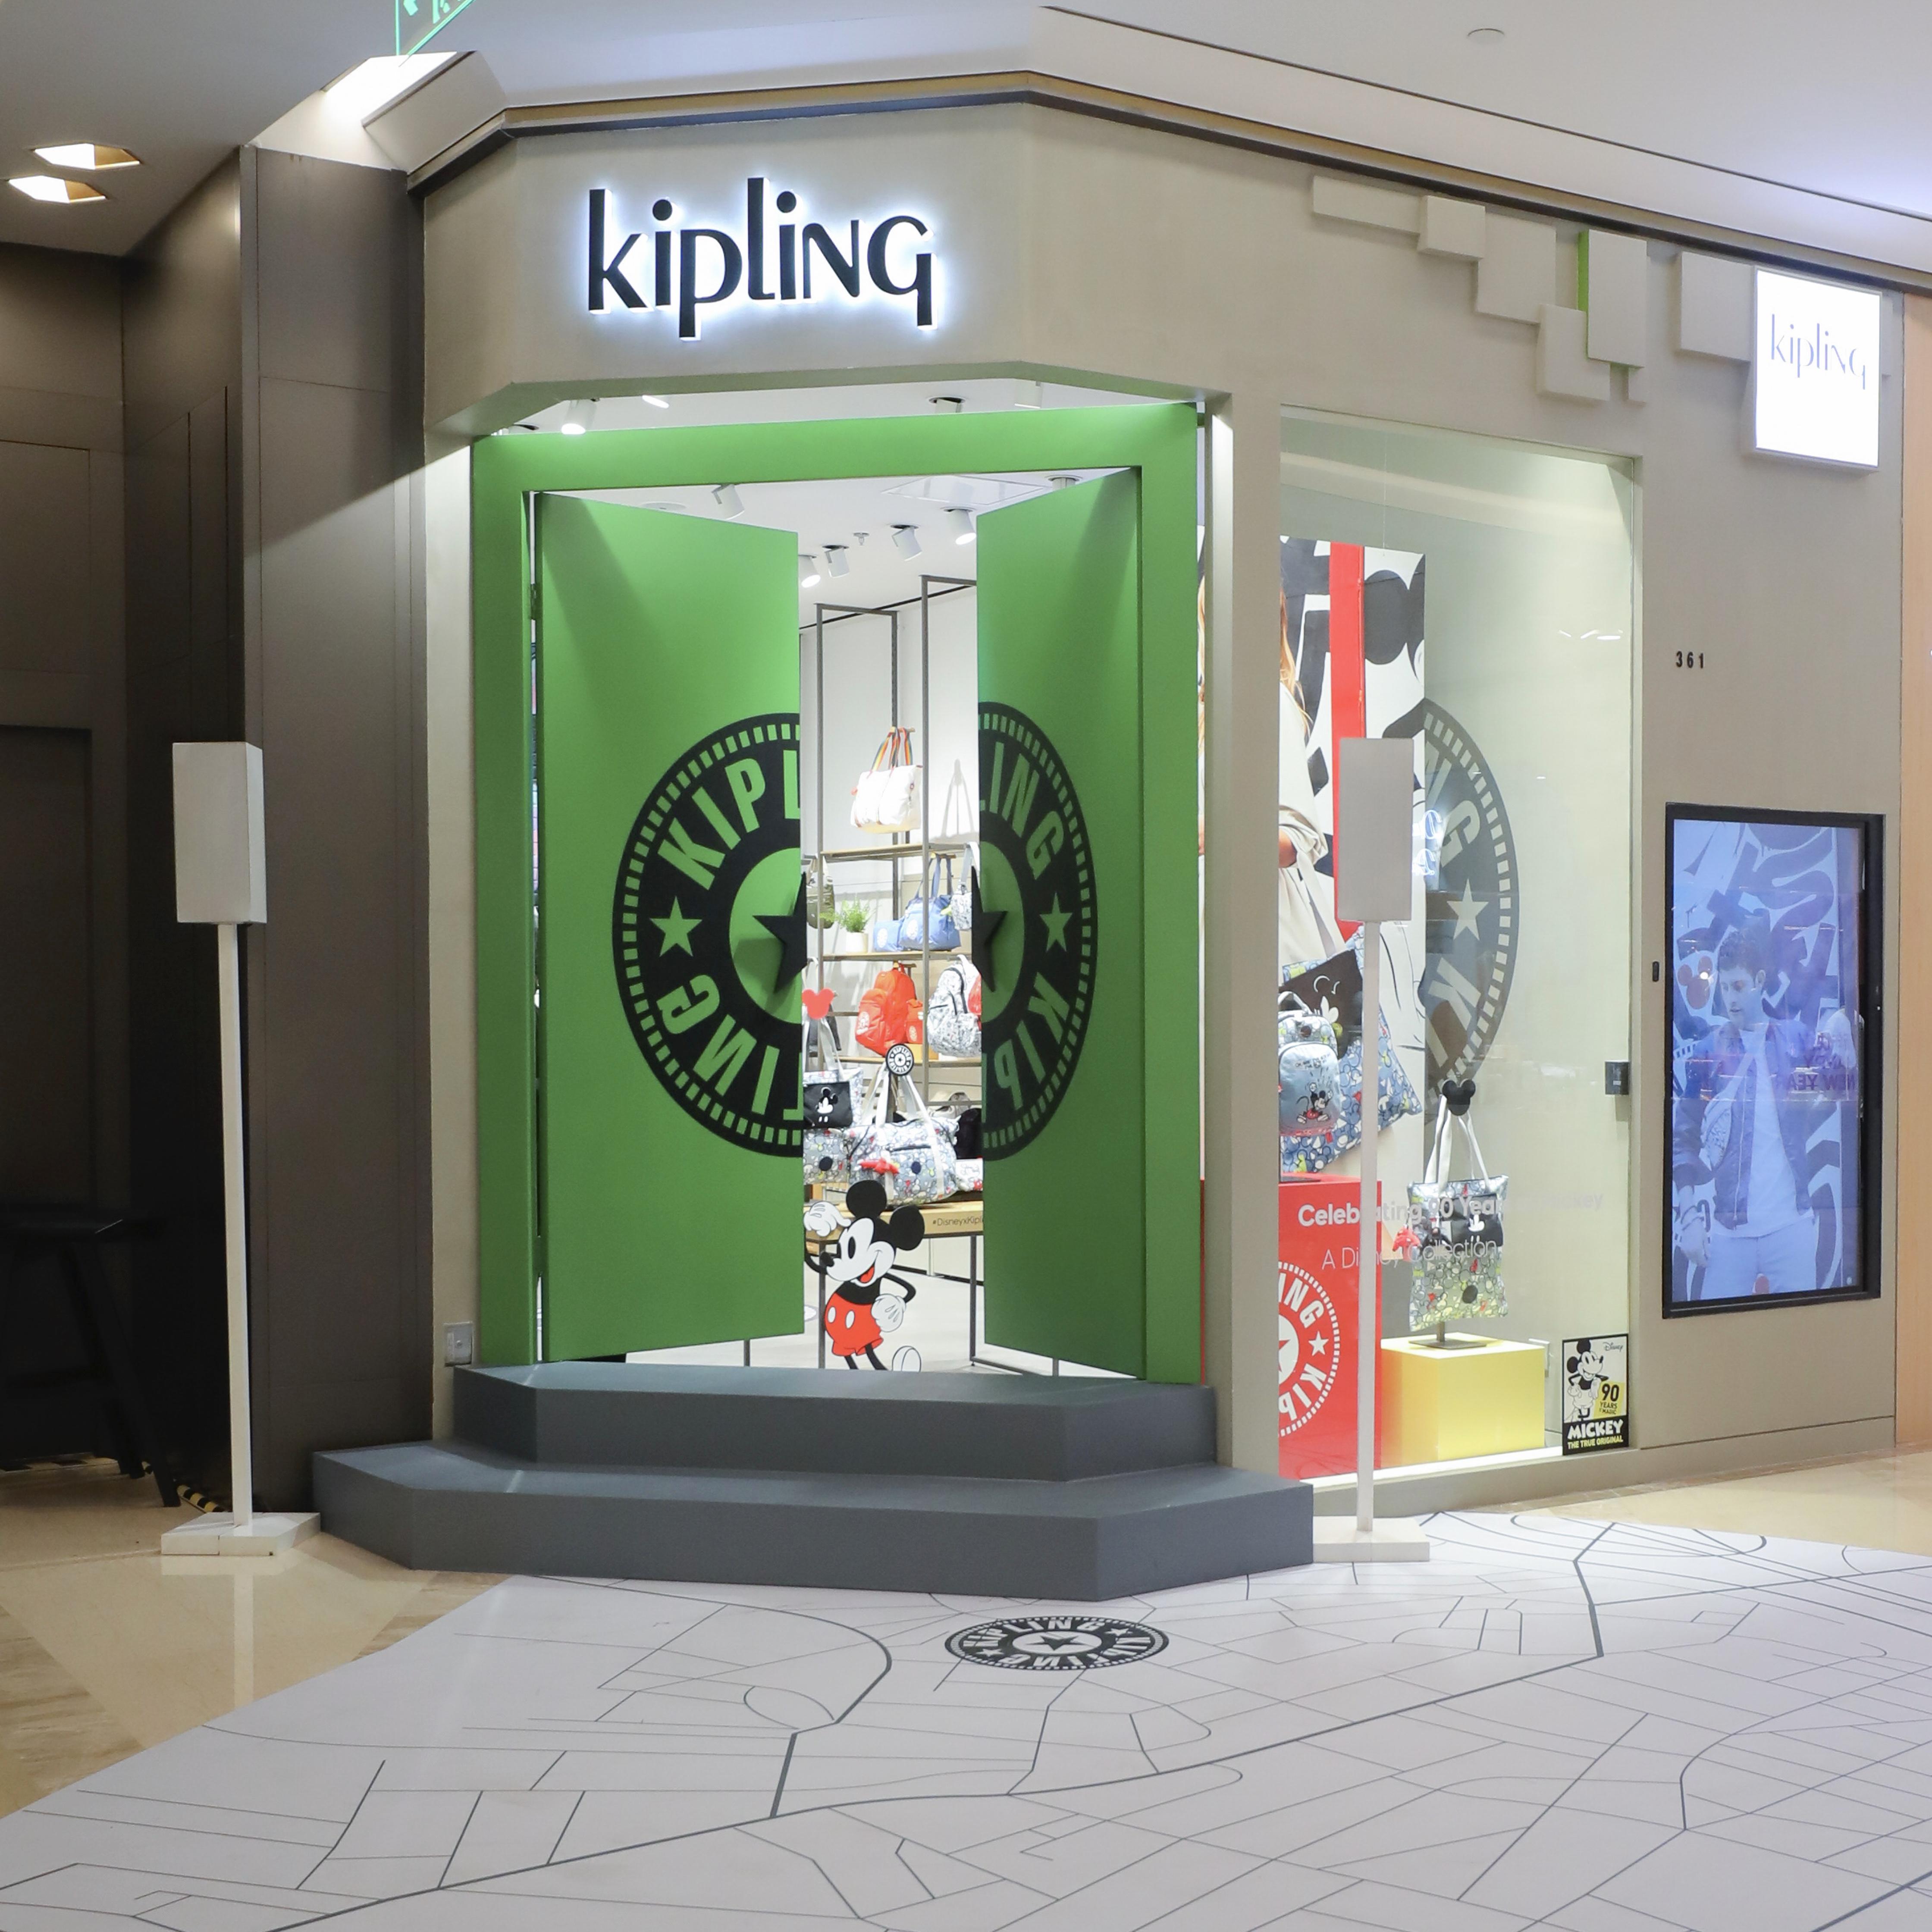 kipling港汇全新概念店,邀请都市年轻人一起 #就要轻潮流图片